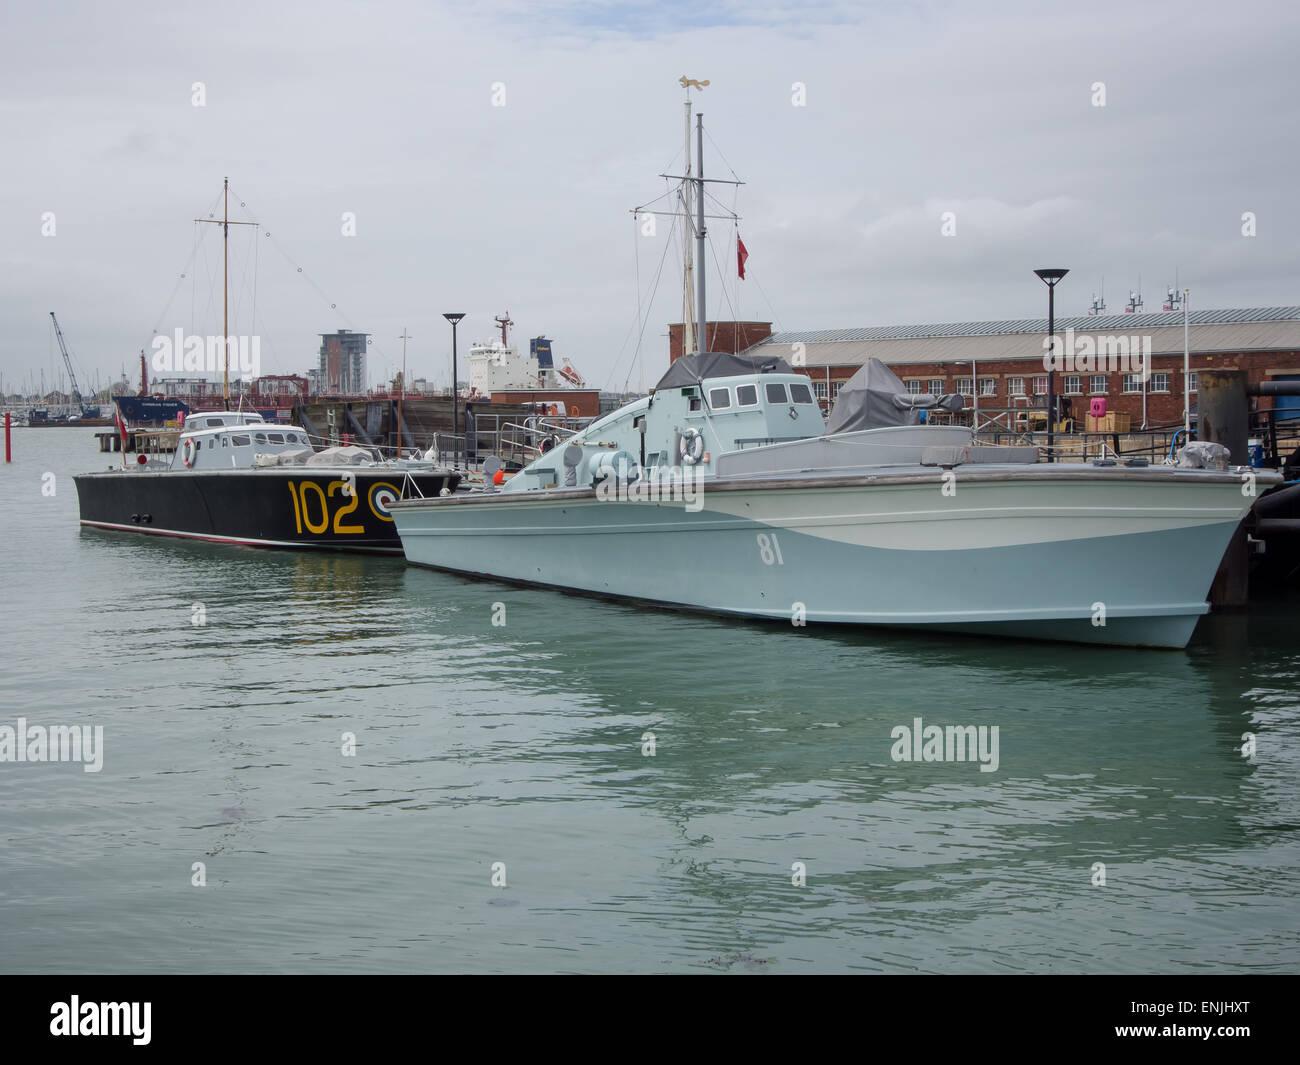 Motor Torpedo Boat 102 And Motor Gun Boat 81 At Portsmouth